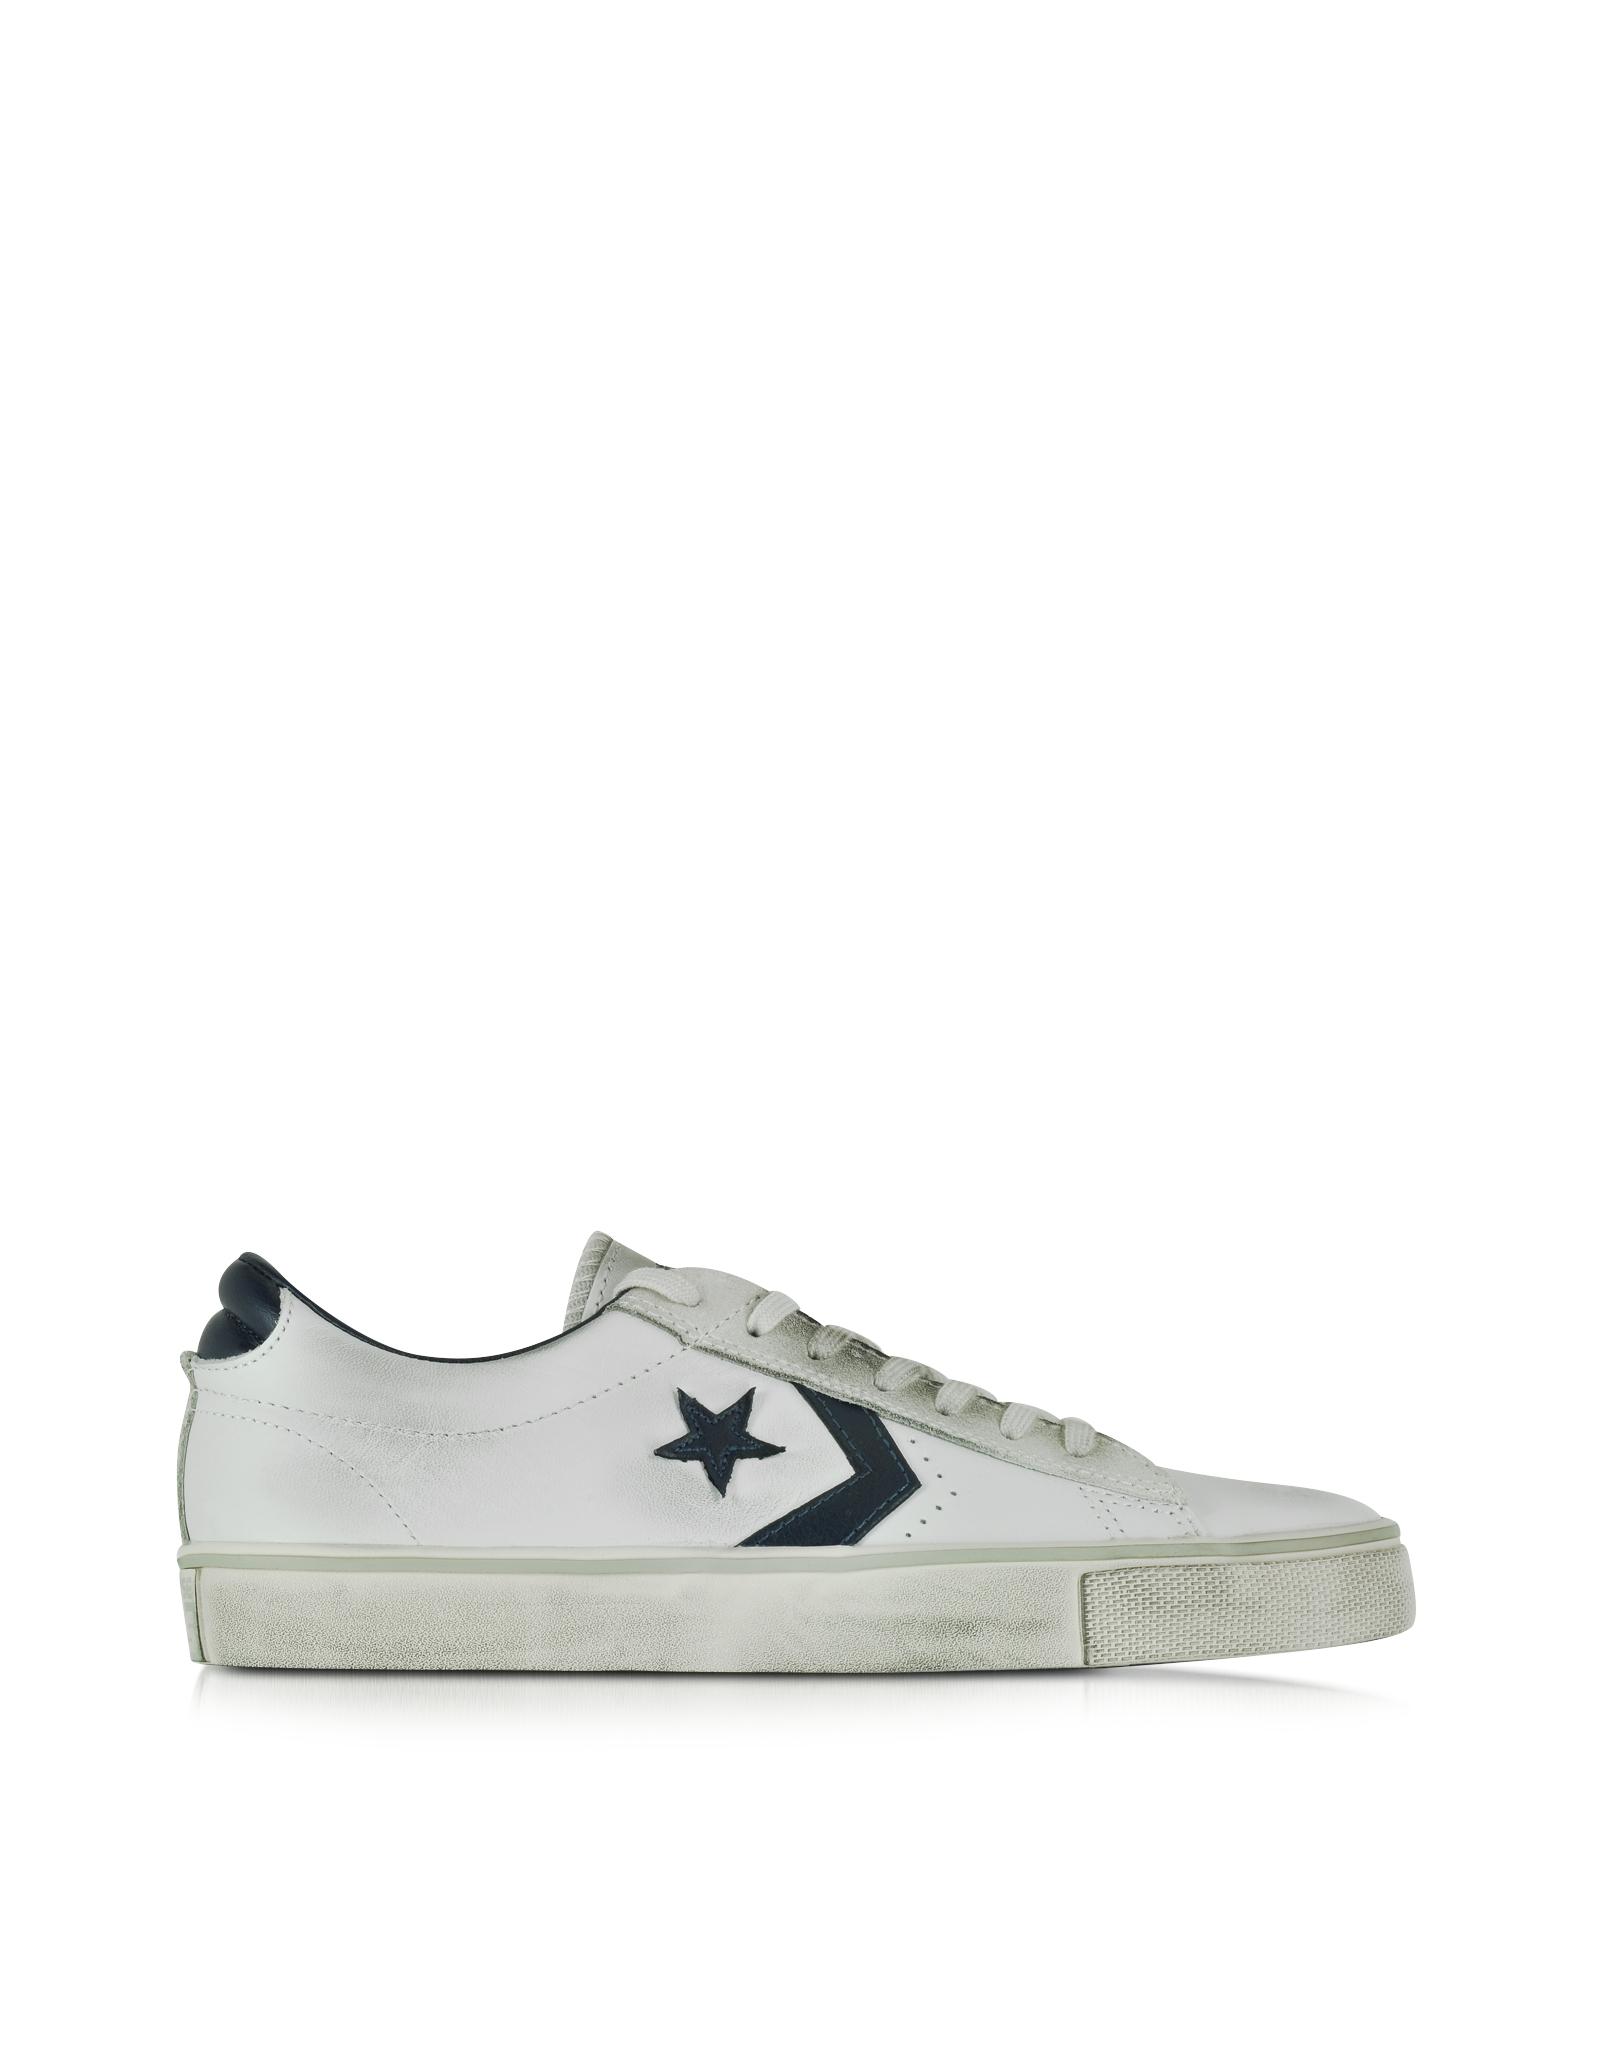 converse scarpe pro leather vulc distressed ox